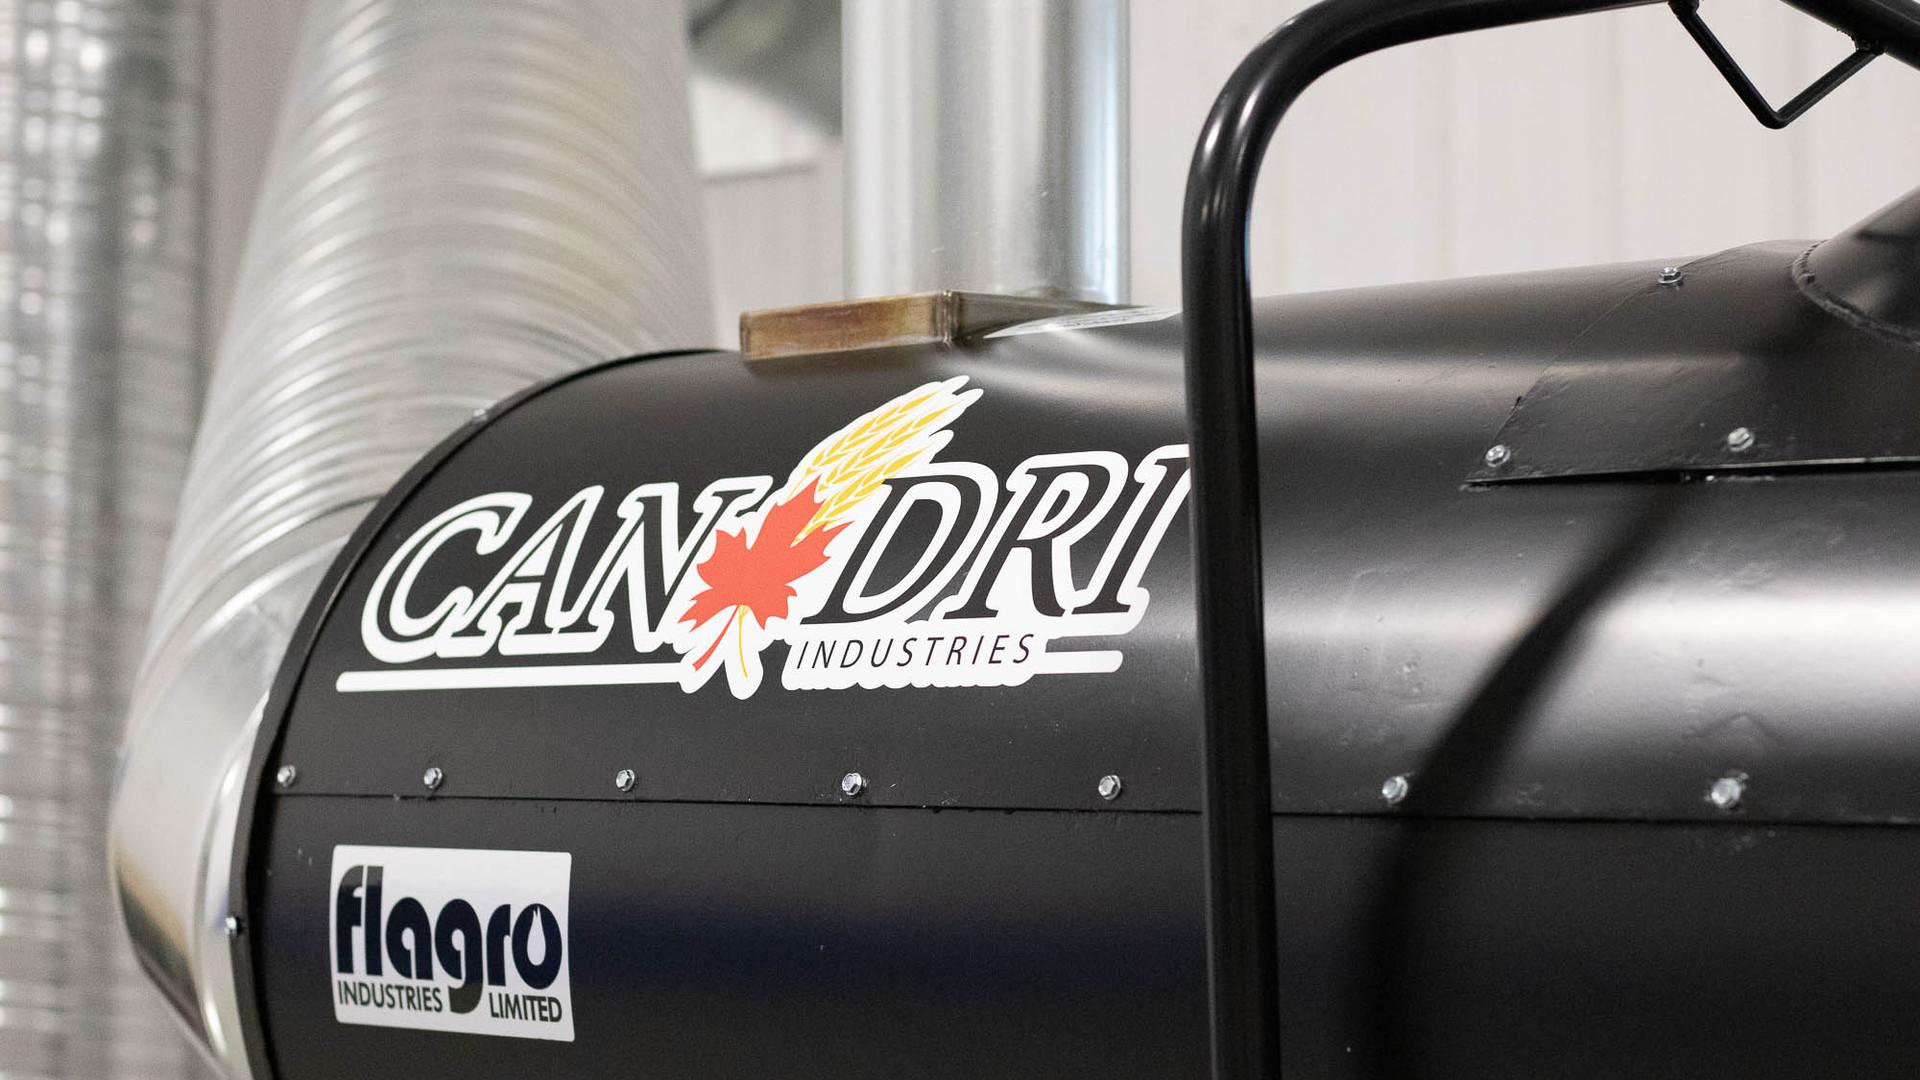 Candri Industries